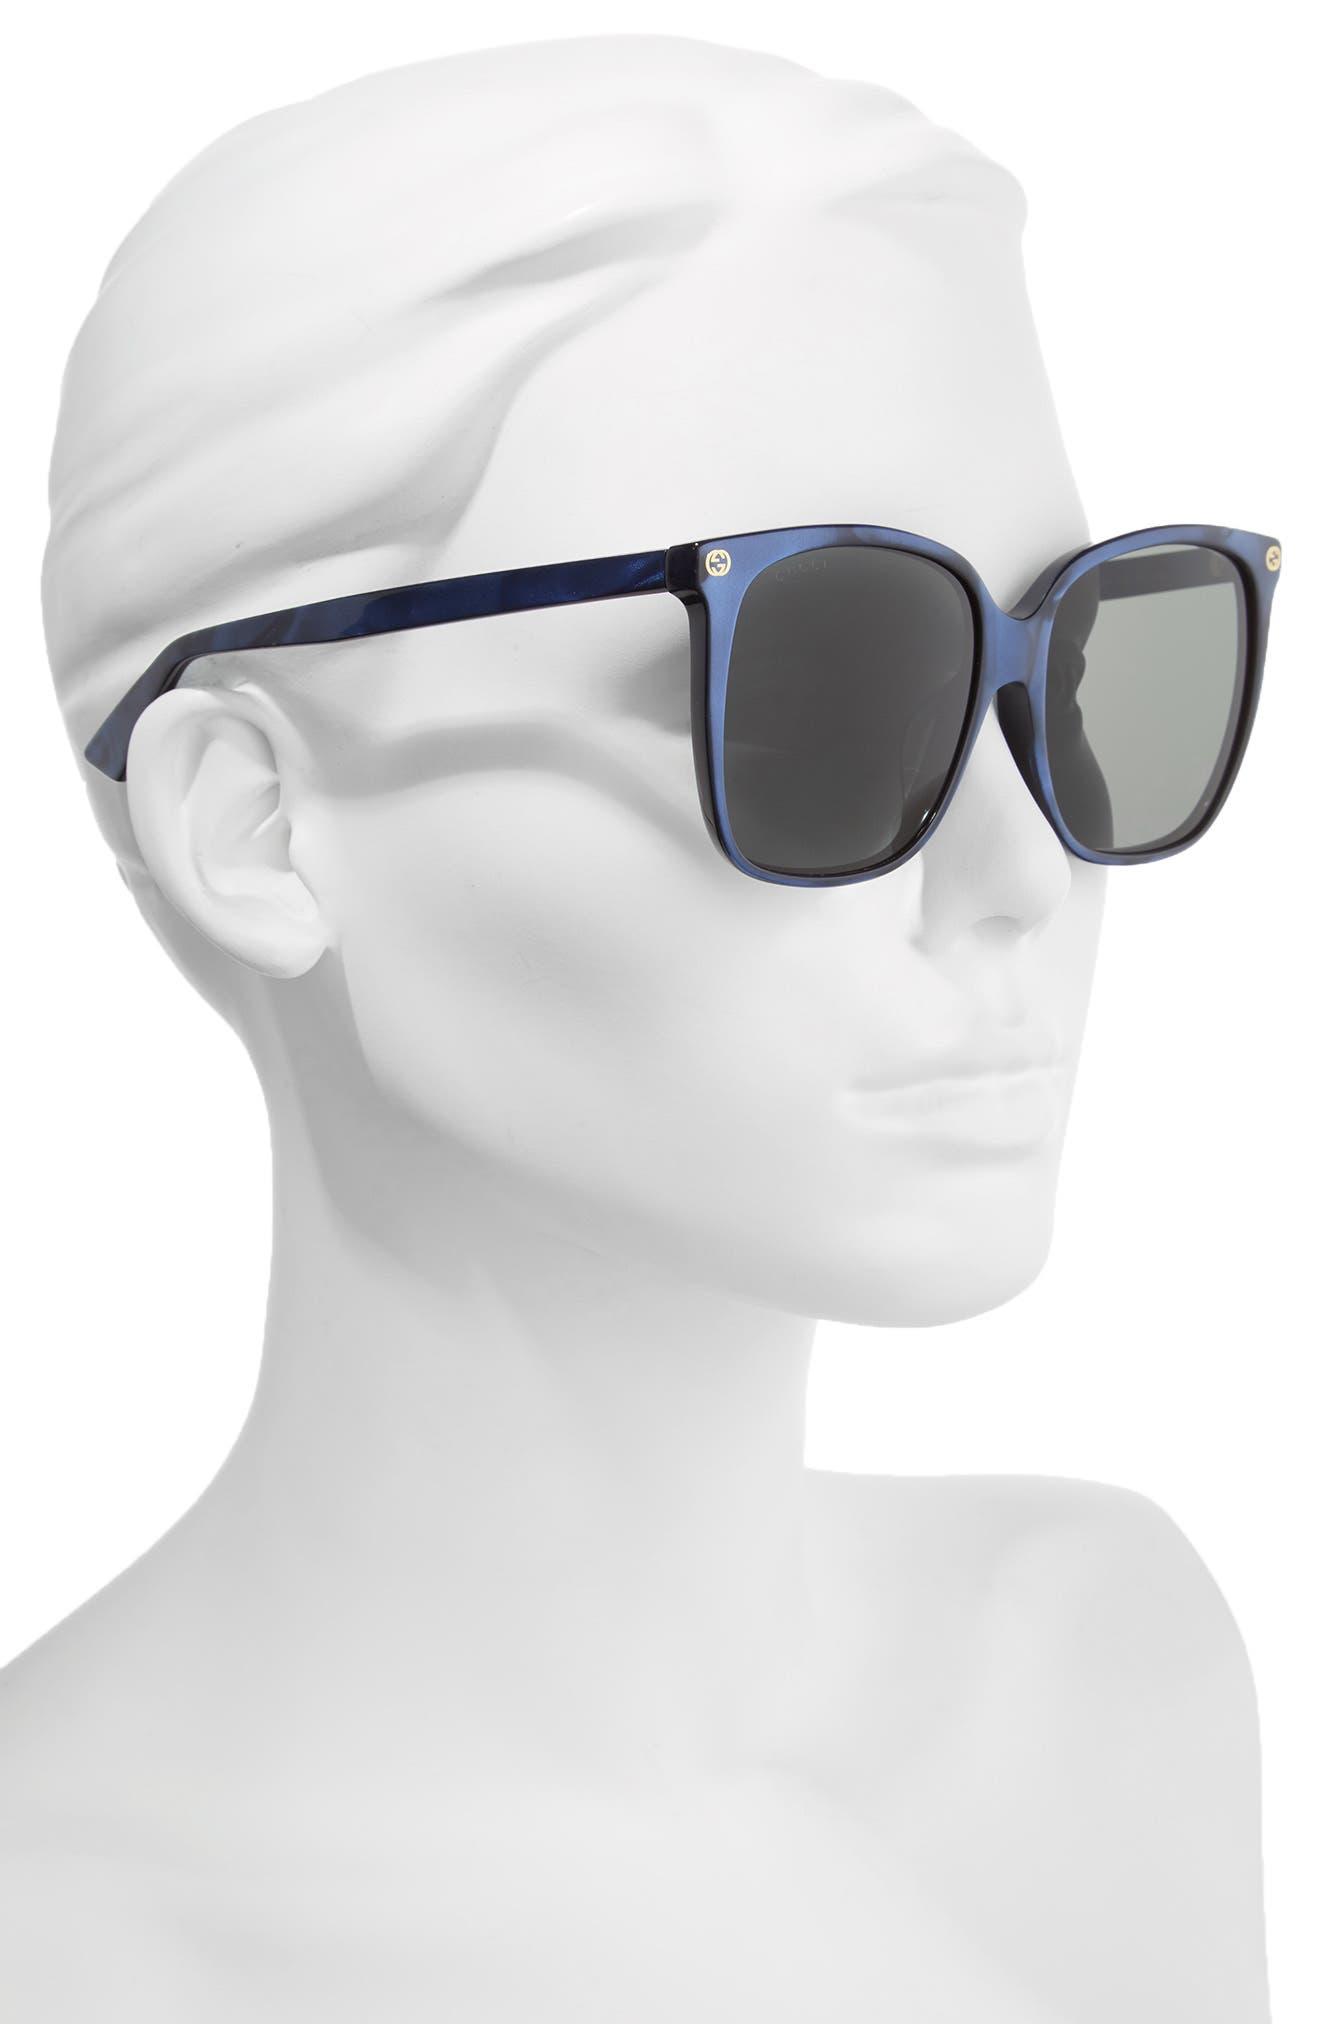 57mm Gradient Sunglasses,                             Alternate thumbnail 2, color,                             400